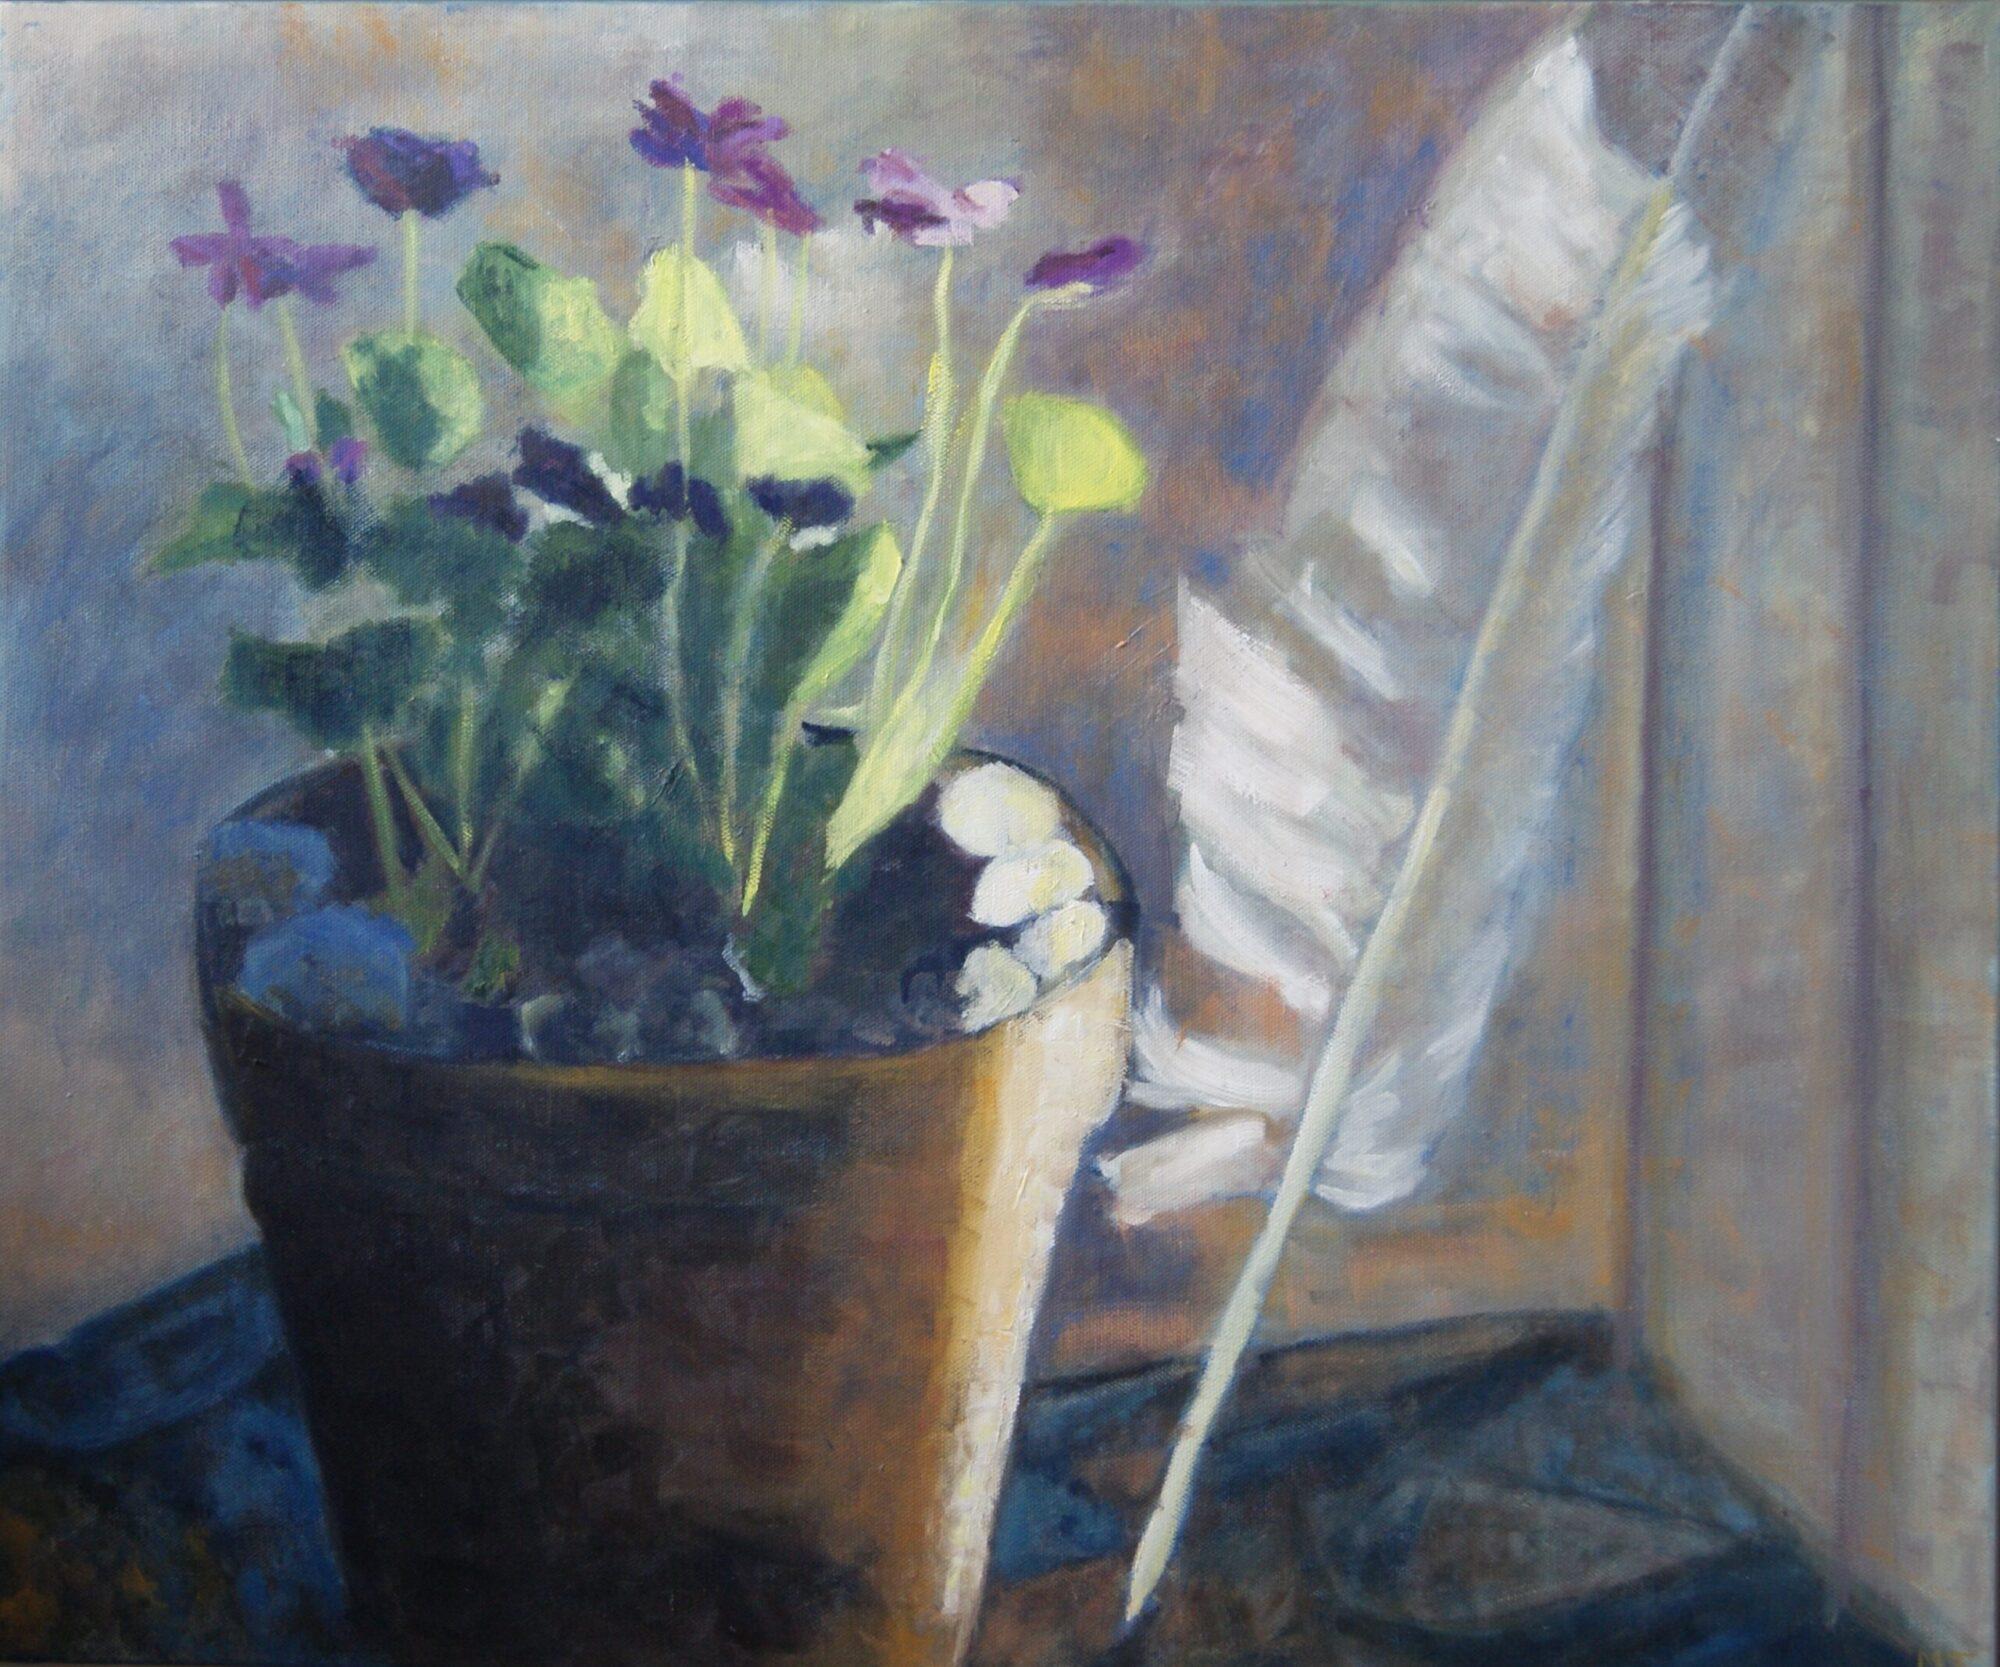 Mette Thorsen Galleri